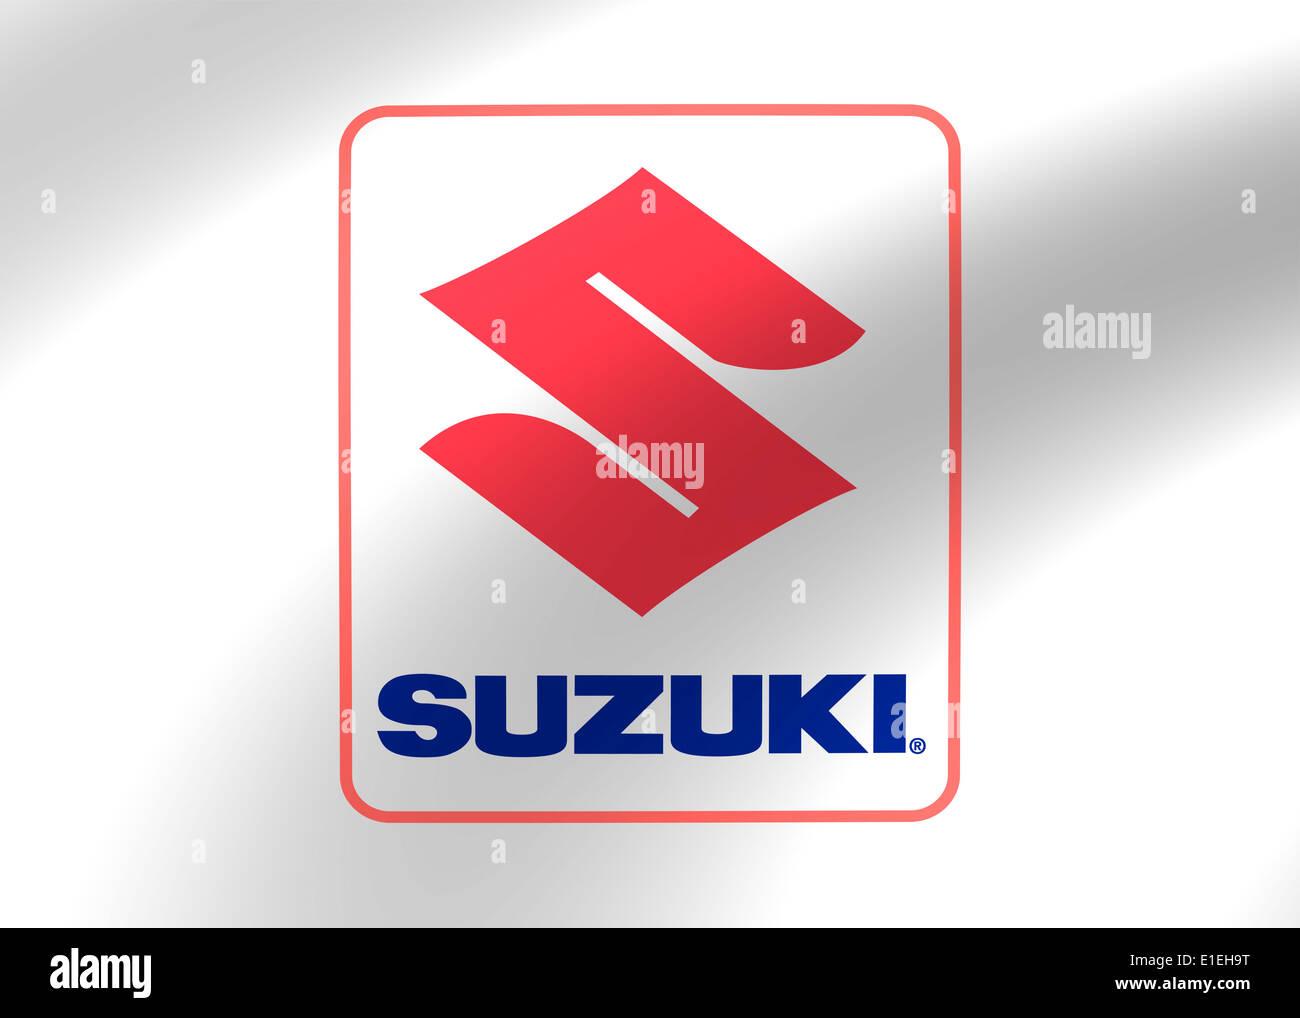 Suzuki logo icon symbol emblem flag Stock Photo: 69777060 - Alamy